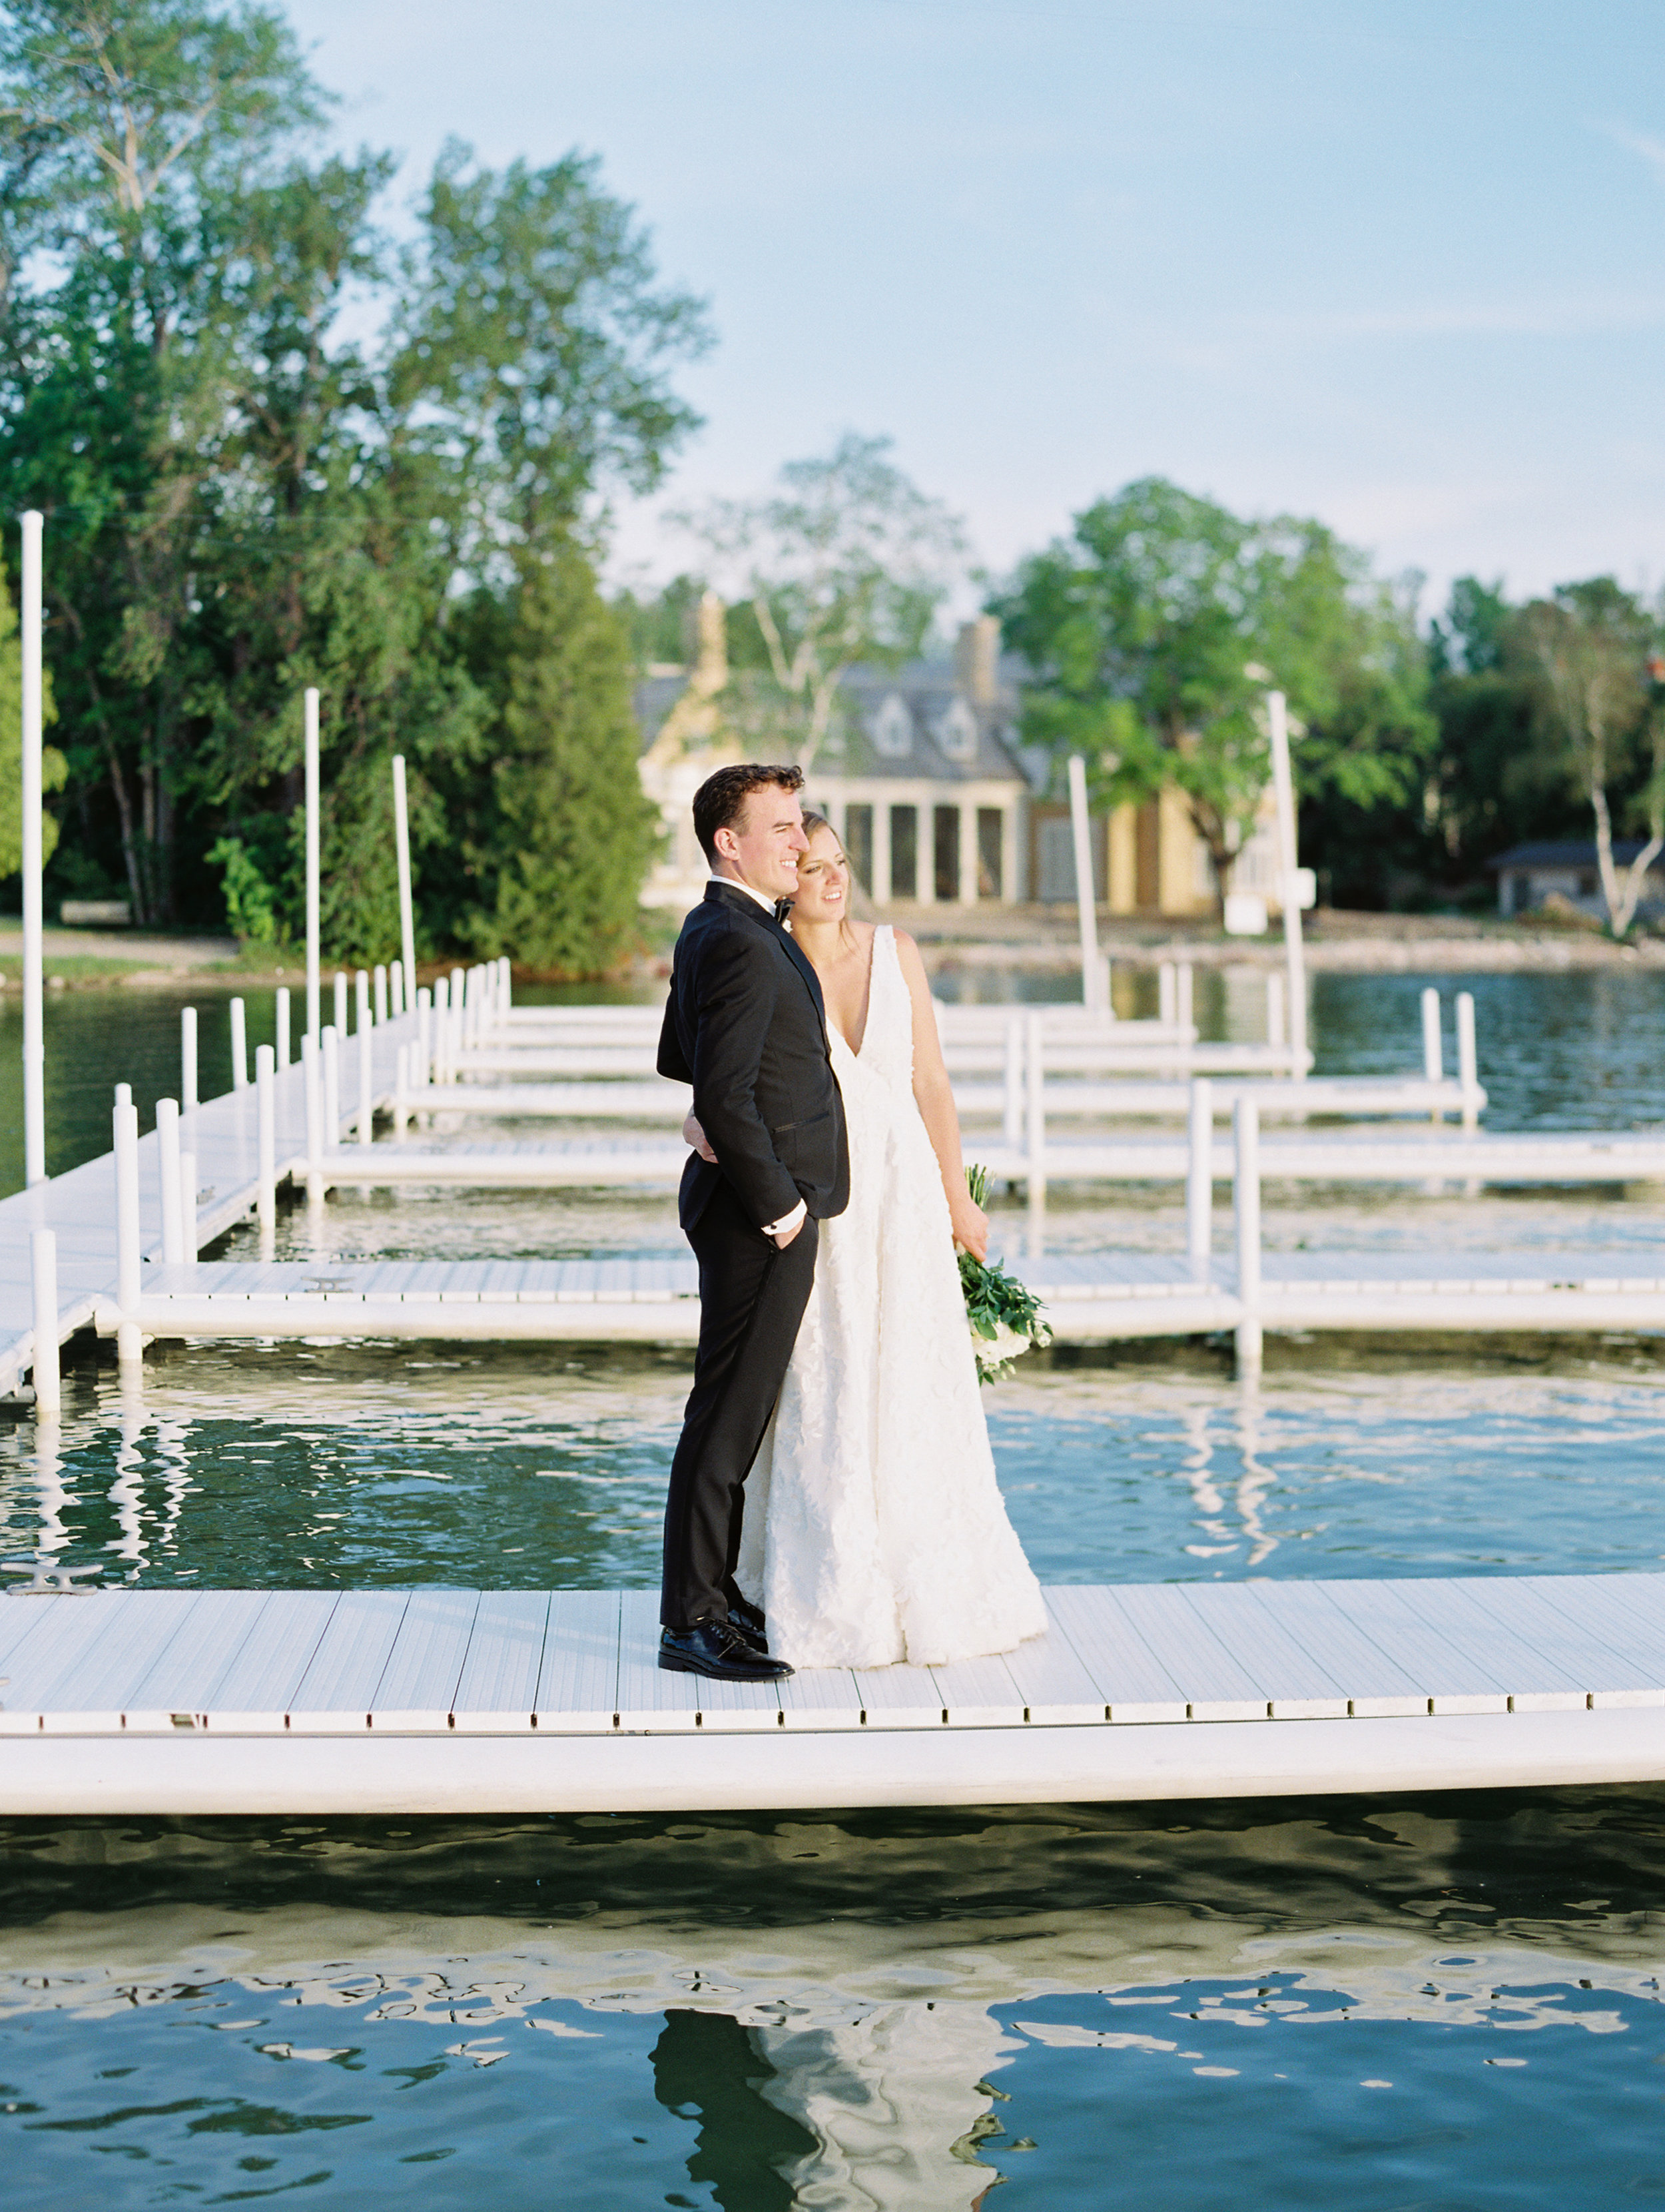 DeGuilio+Wedding+BrideGroomSunsetf-7.jpg